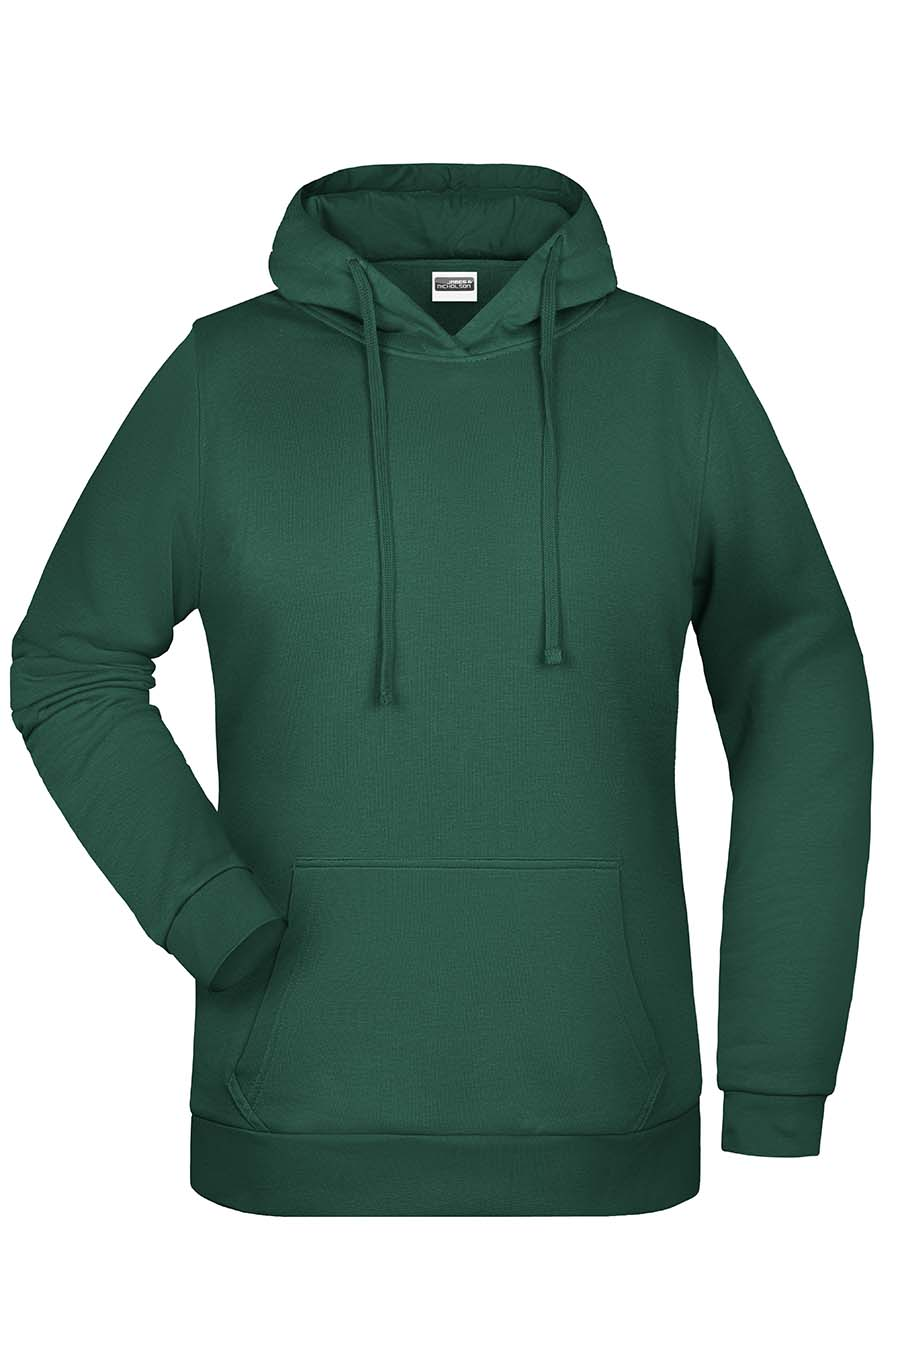 Sweat-shirt capuche femme - 20-1494-4